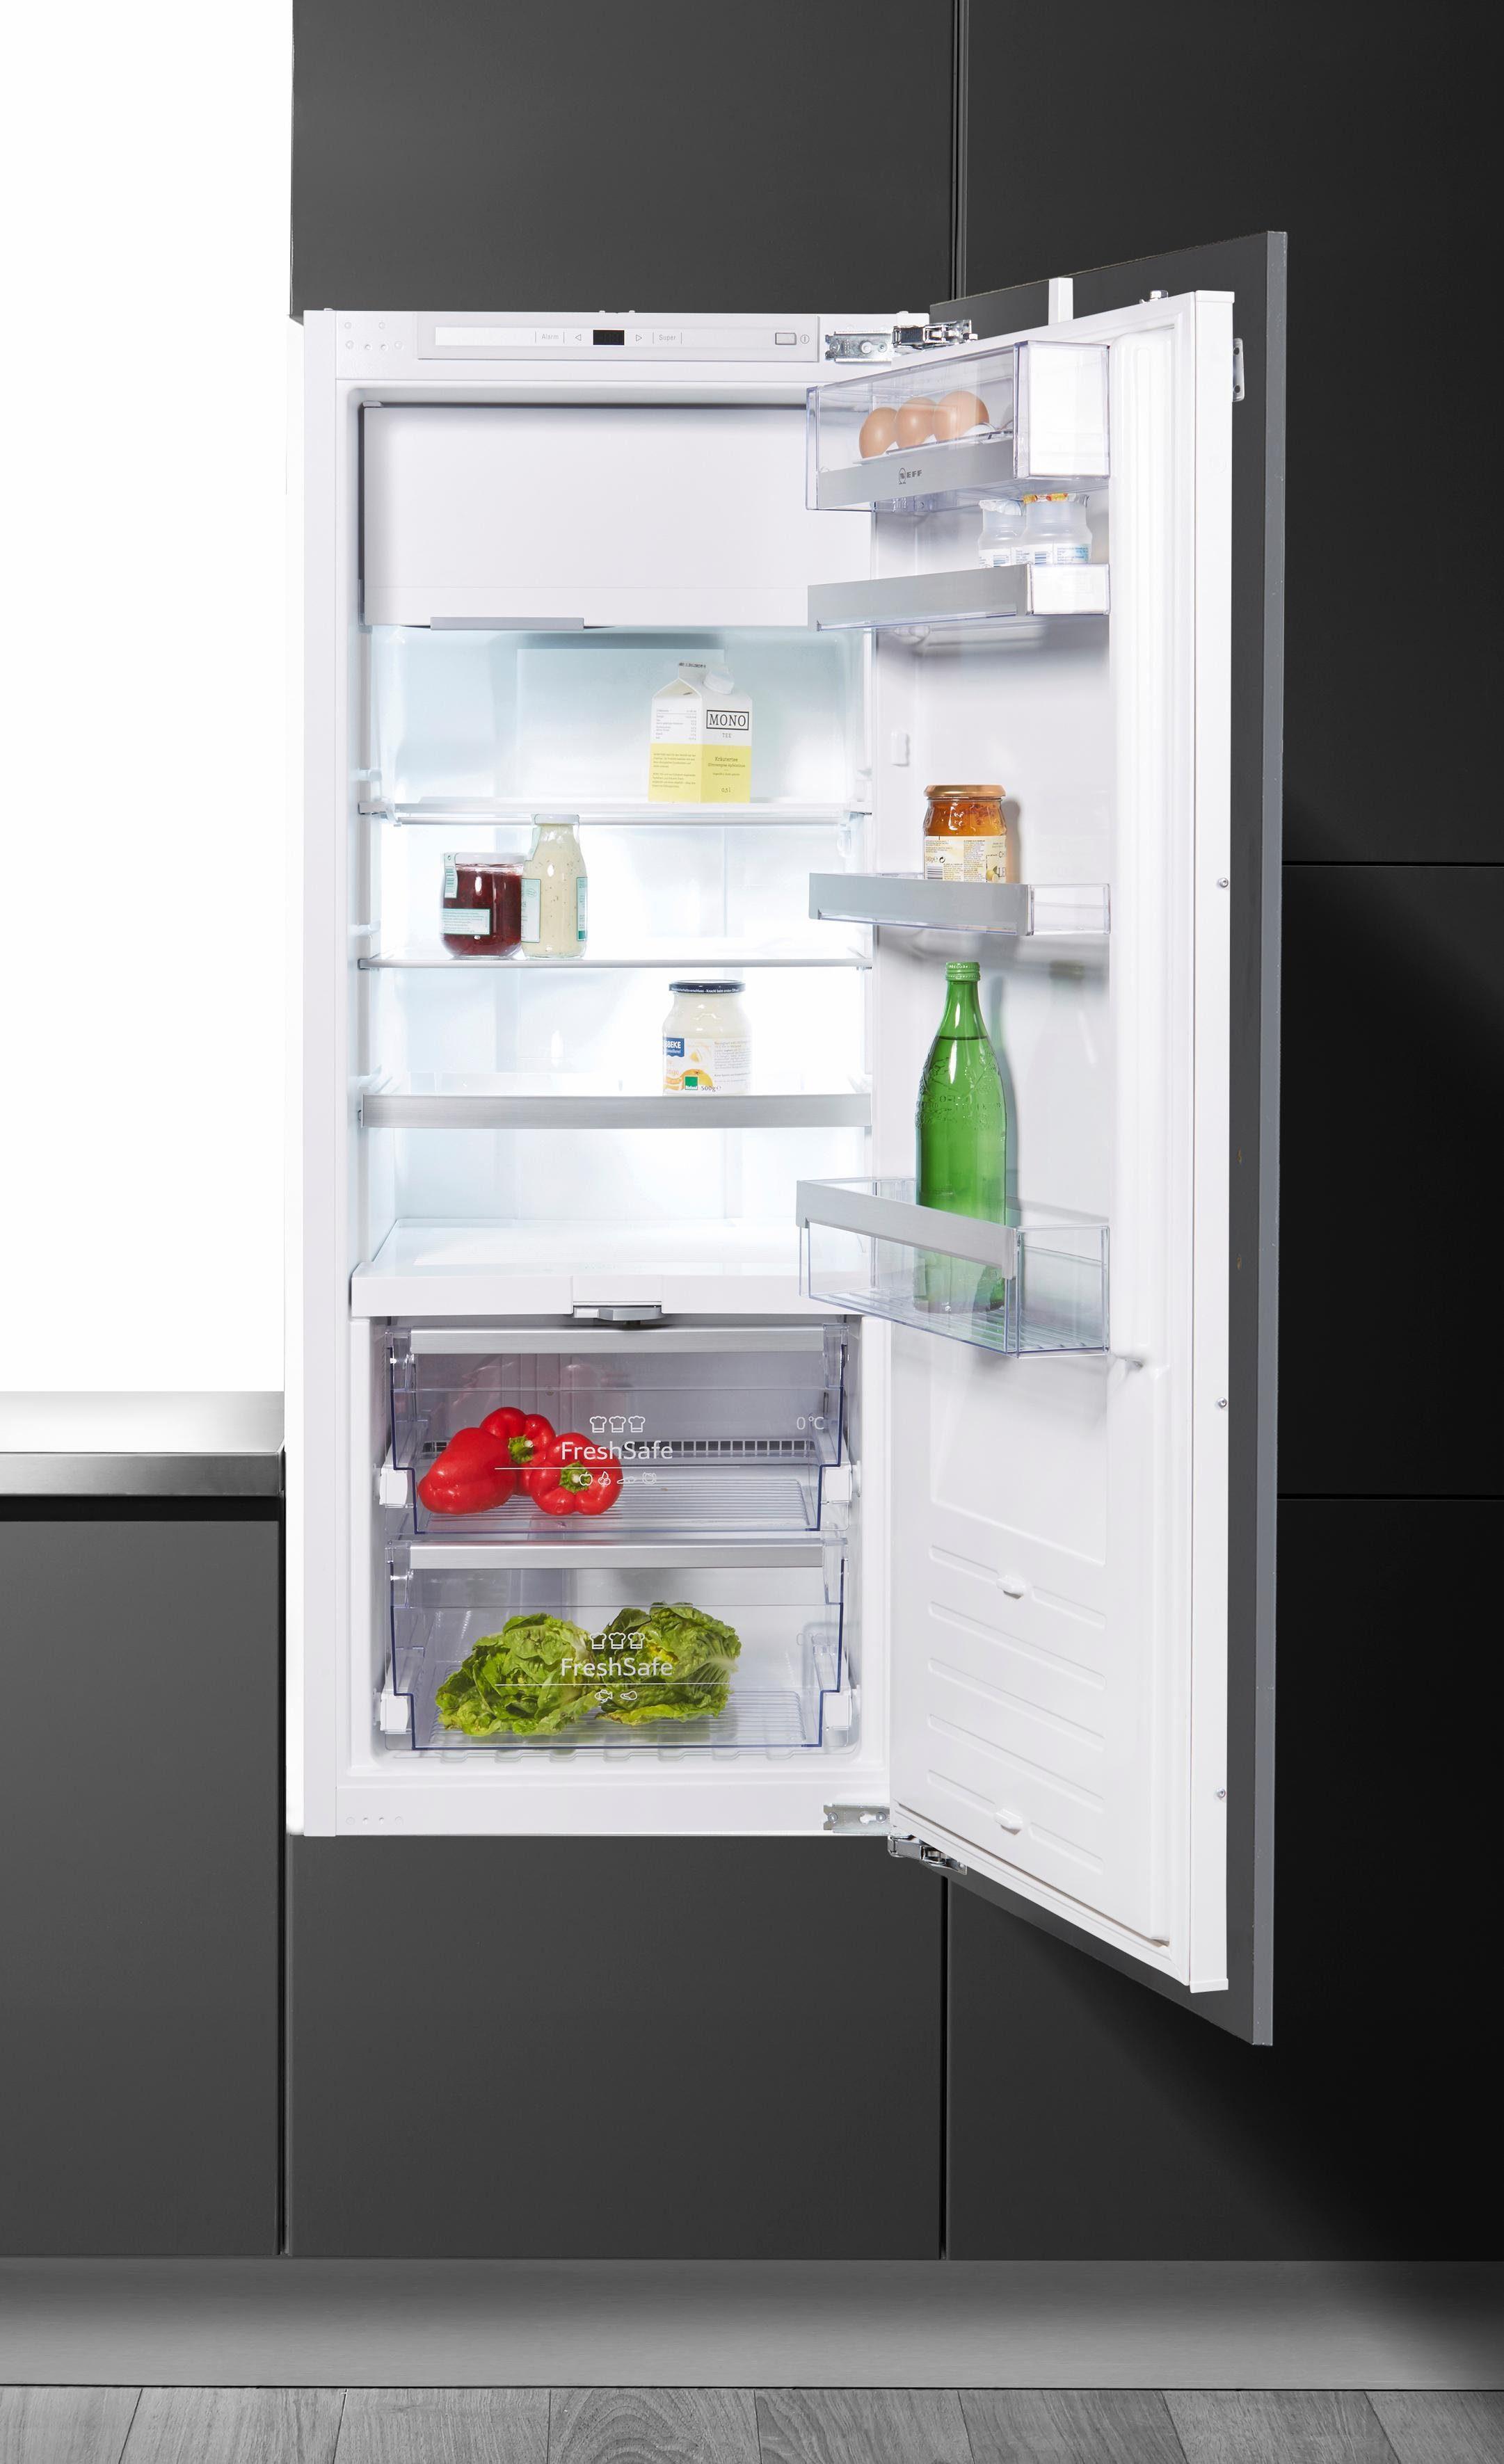 NEFF Einbaukühlschrank KN546A2 / KI8523D30, 140,0 cm hoch, 56,0 cm breit, integrierbar